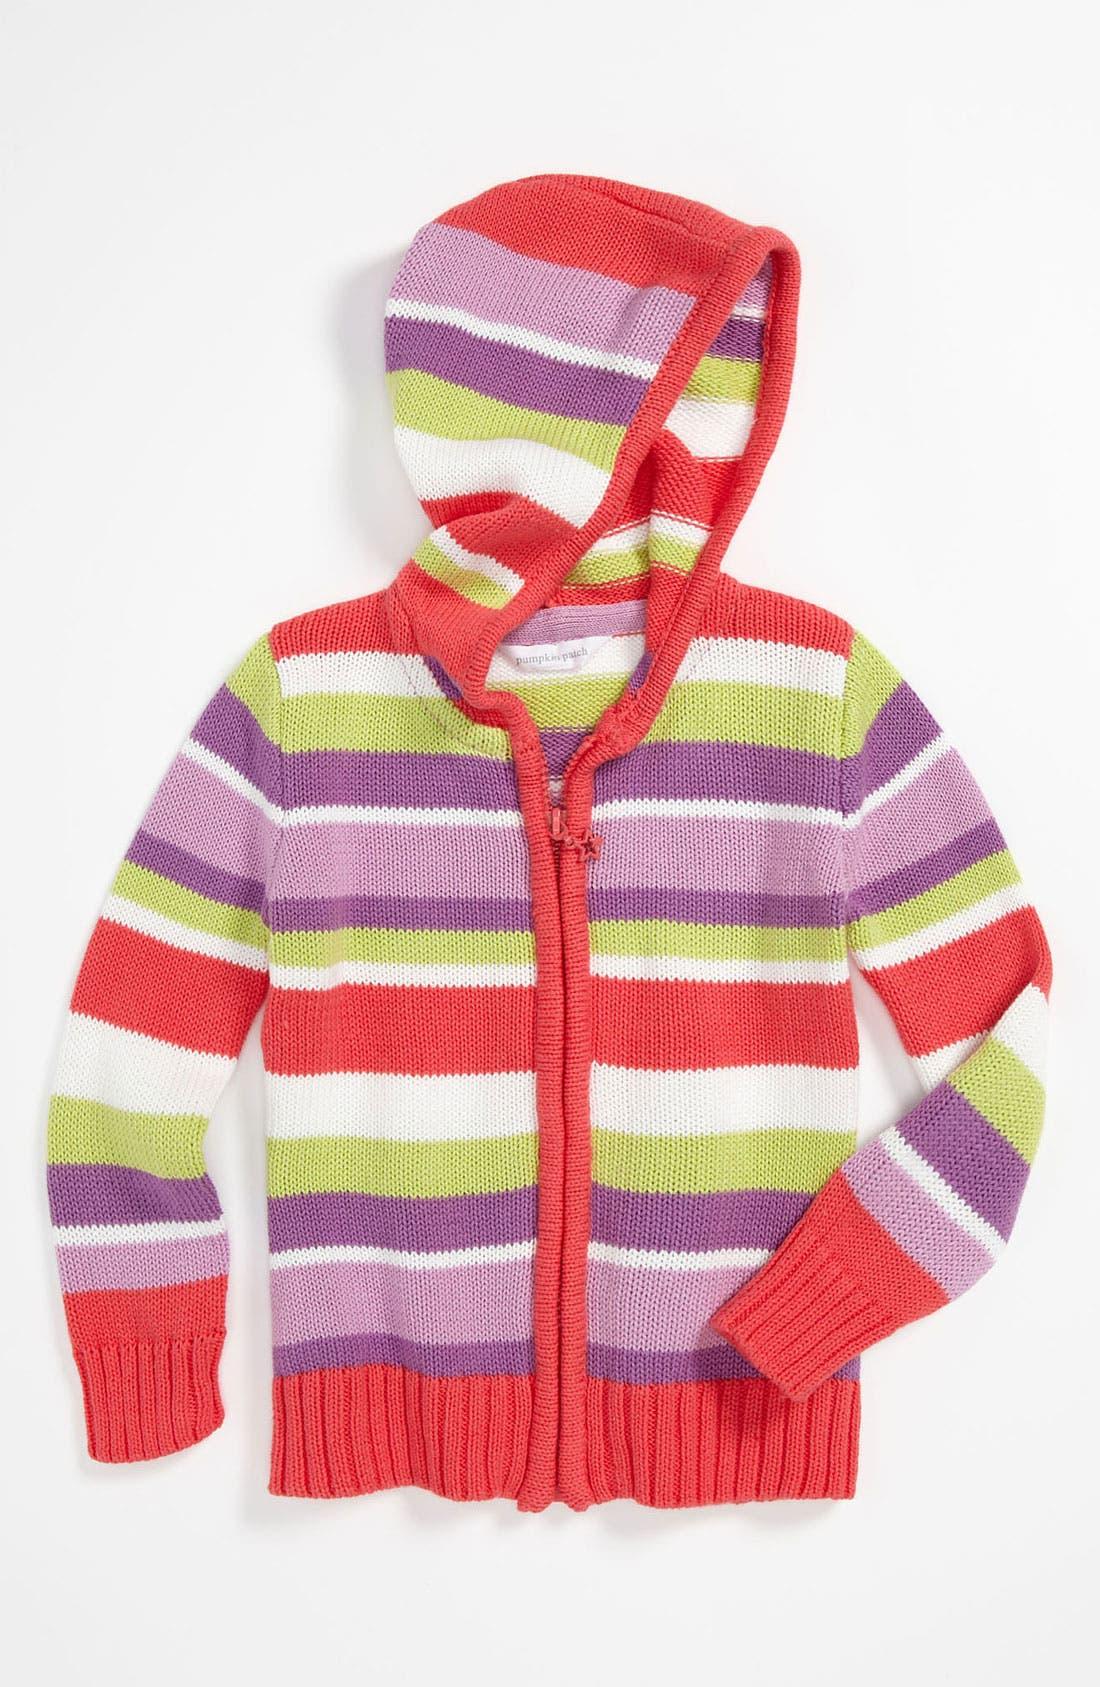 Alternate Image 1 Selected - Pumpkin Patch Hooded Cardigan (Toddler)